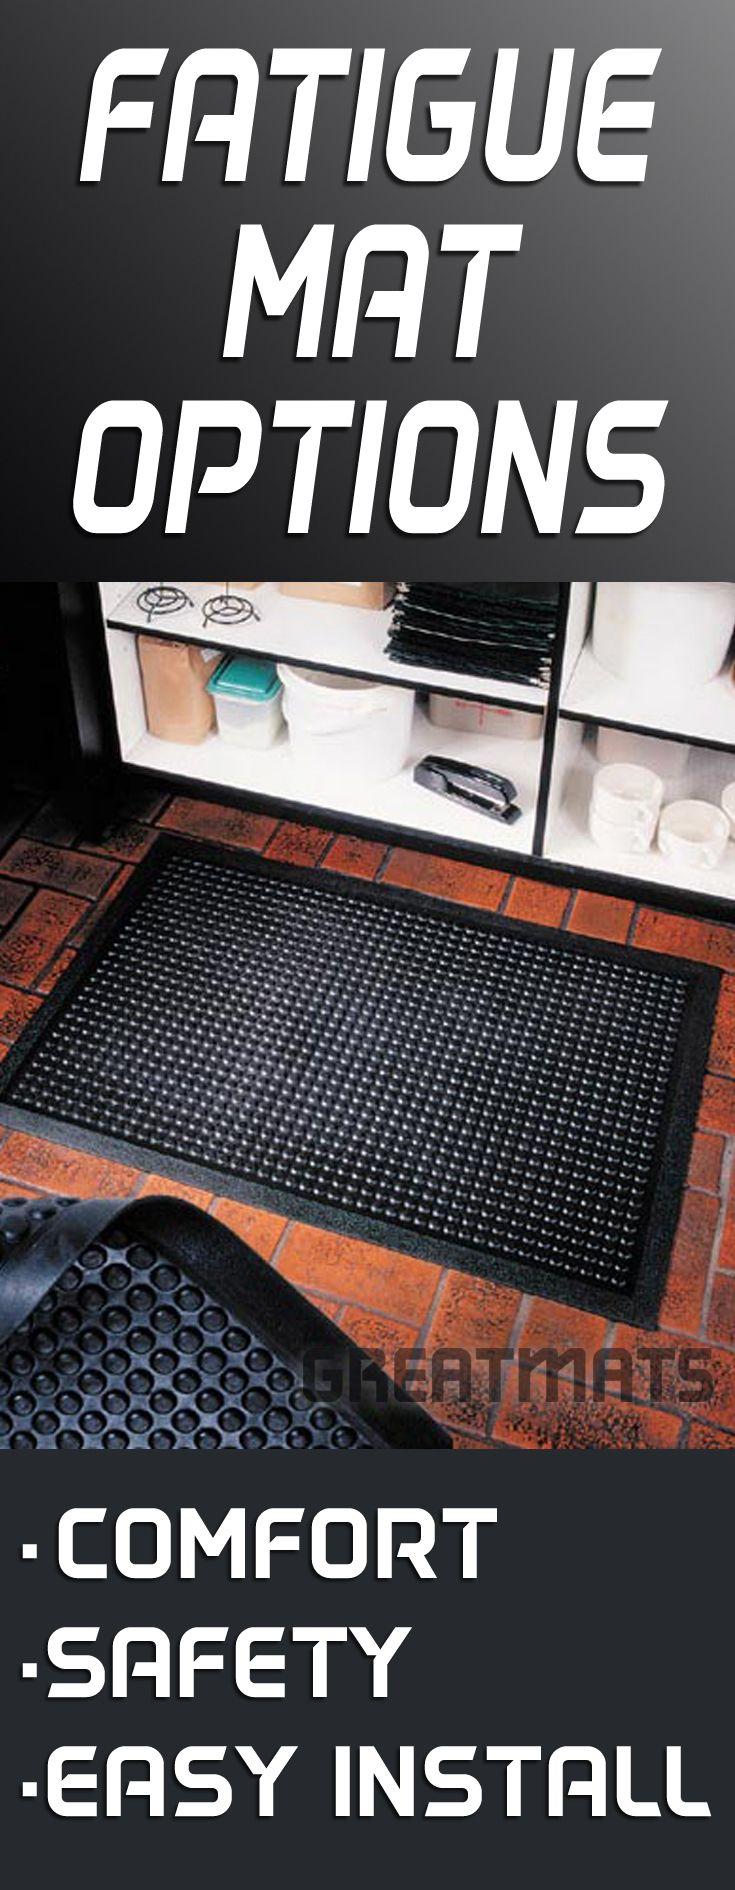 floor rug truck mats irish products dame carpet of piece fighting rv decor accessories floors area notre mat suv car university auto